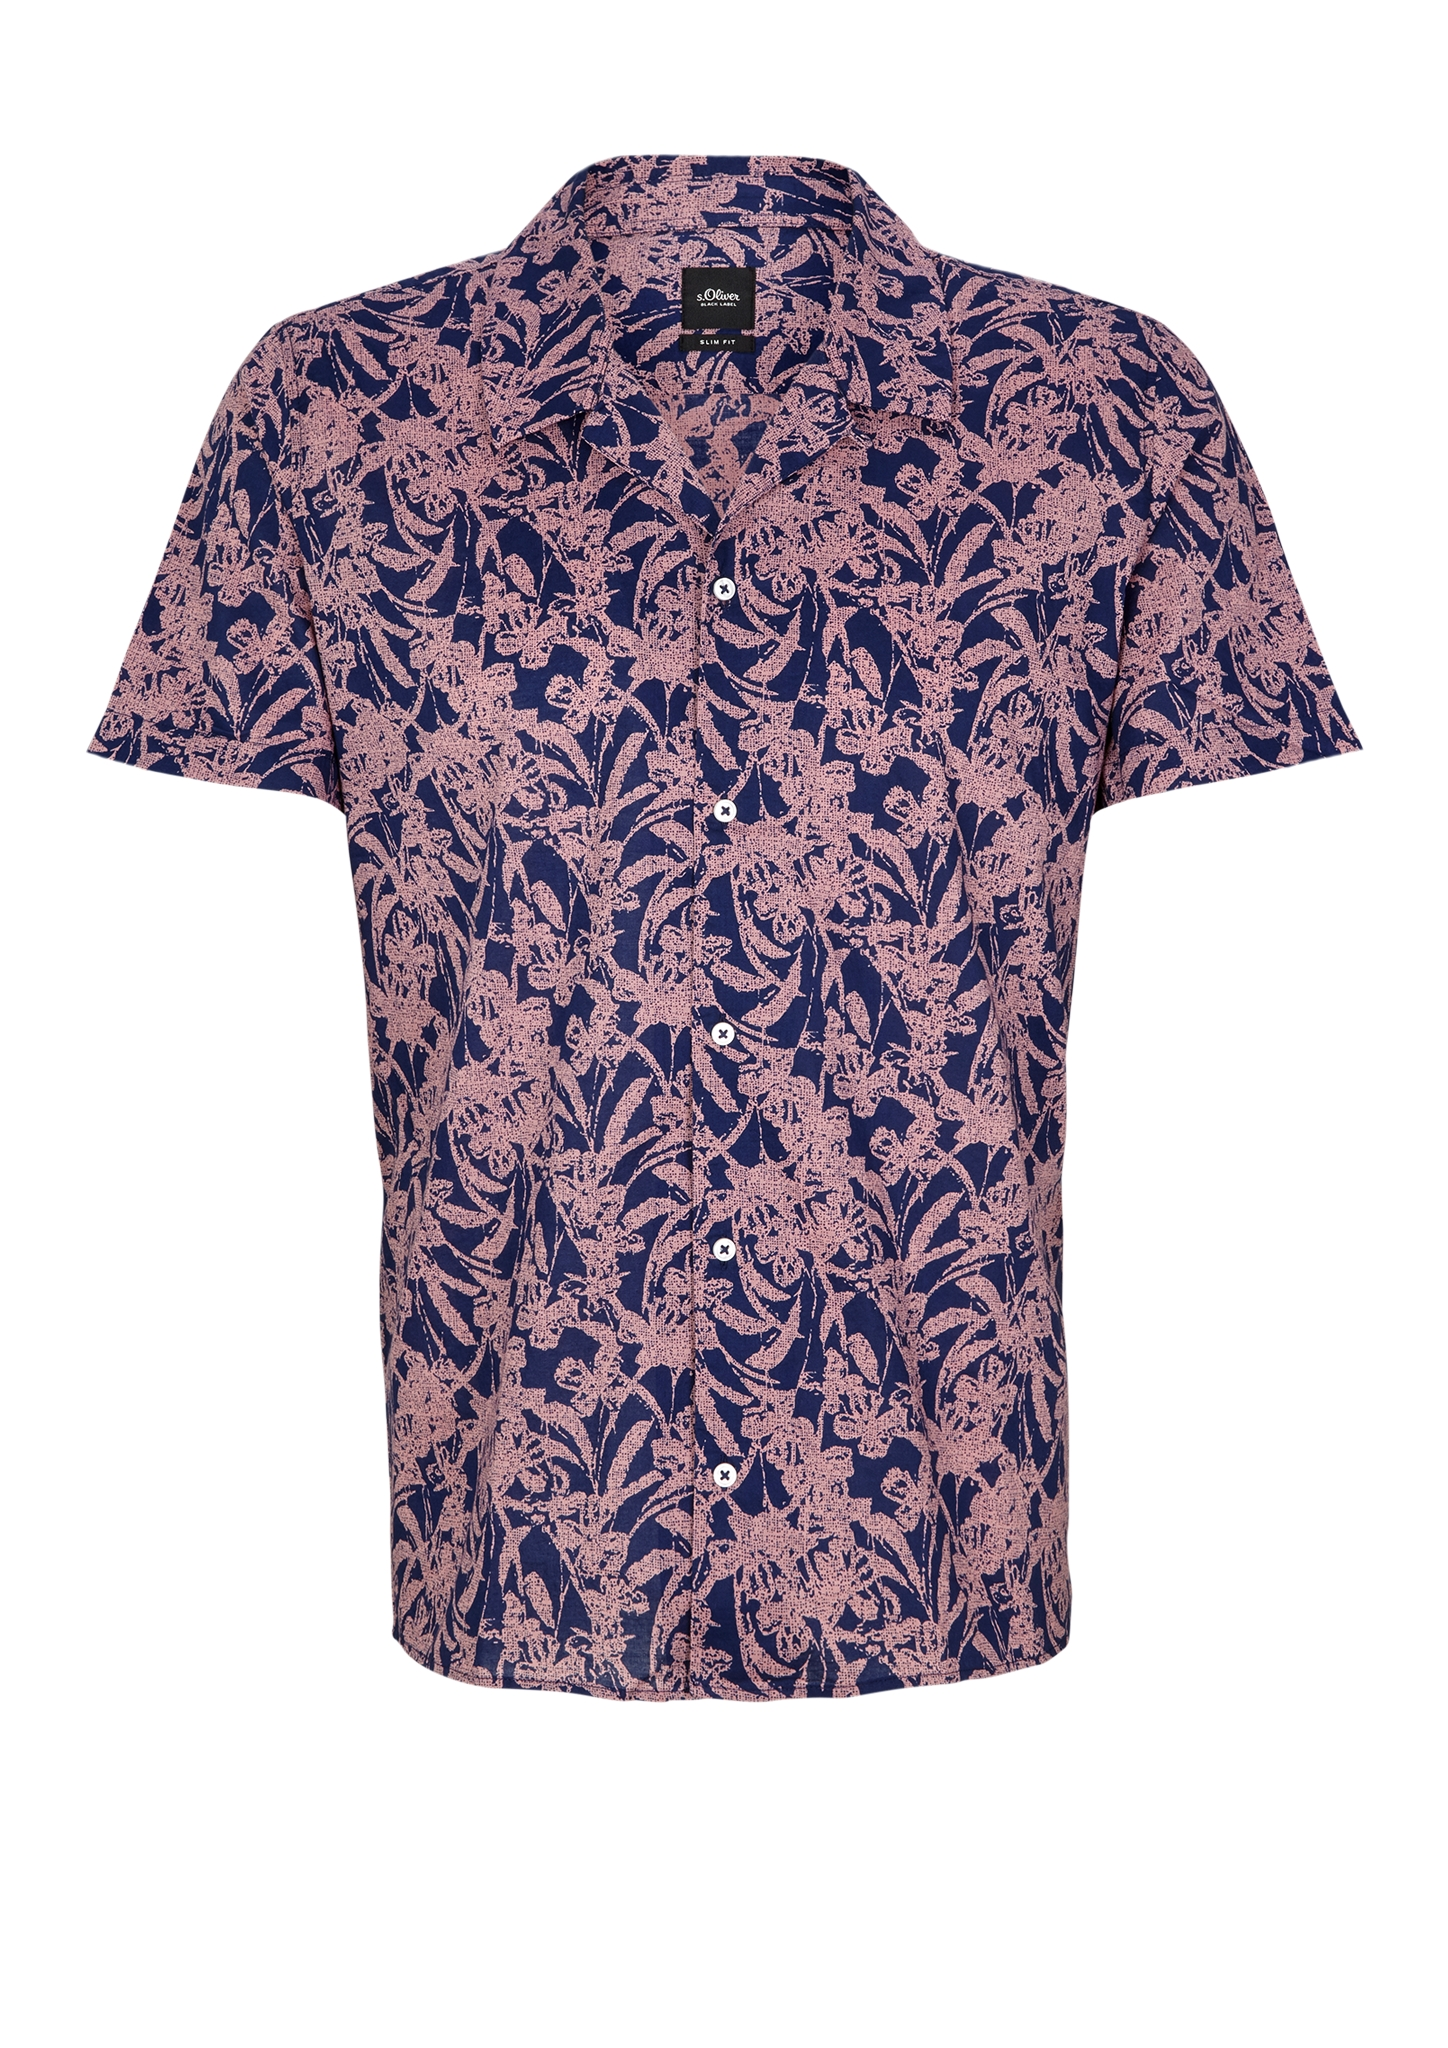 Hawaiihemd | Bekleidung > Hemden > Hawaiihemden | s.Oliver BLACK LABEL